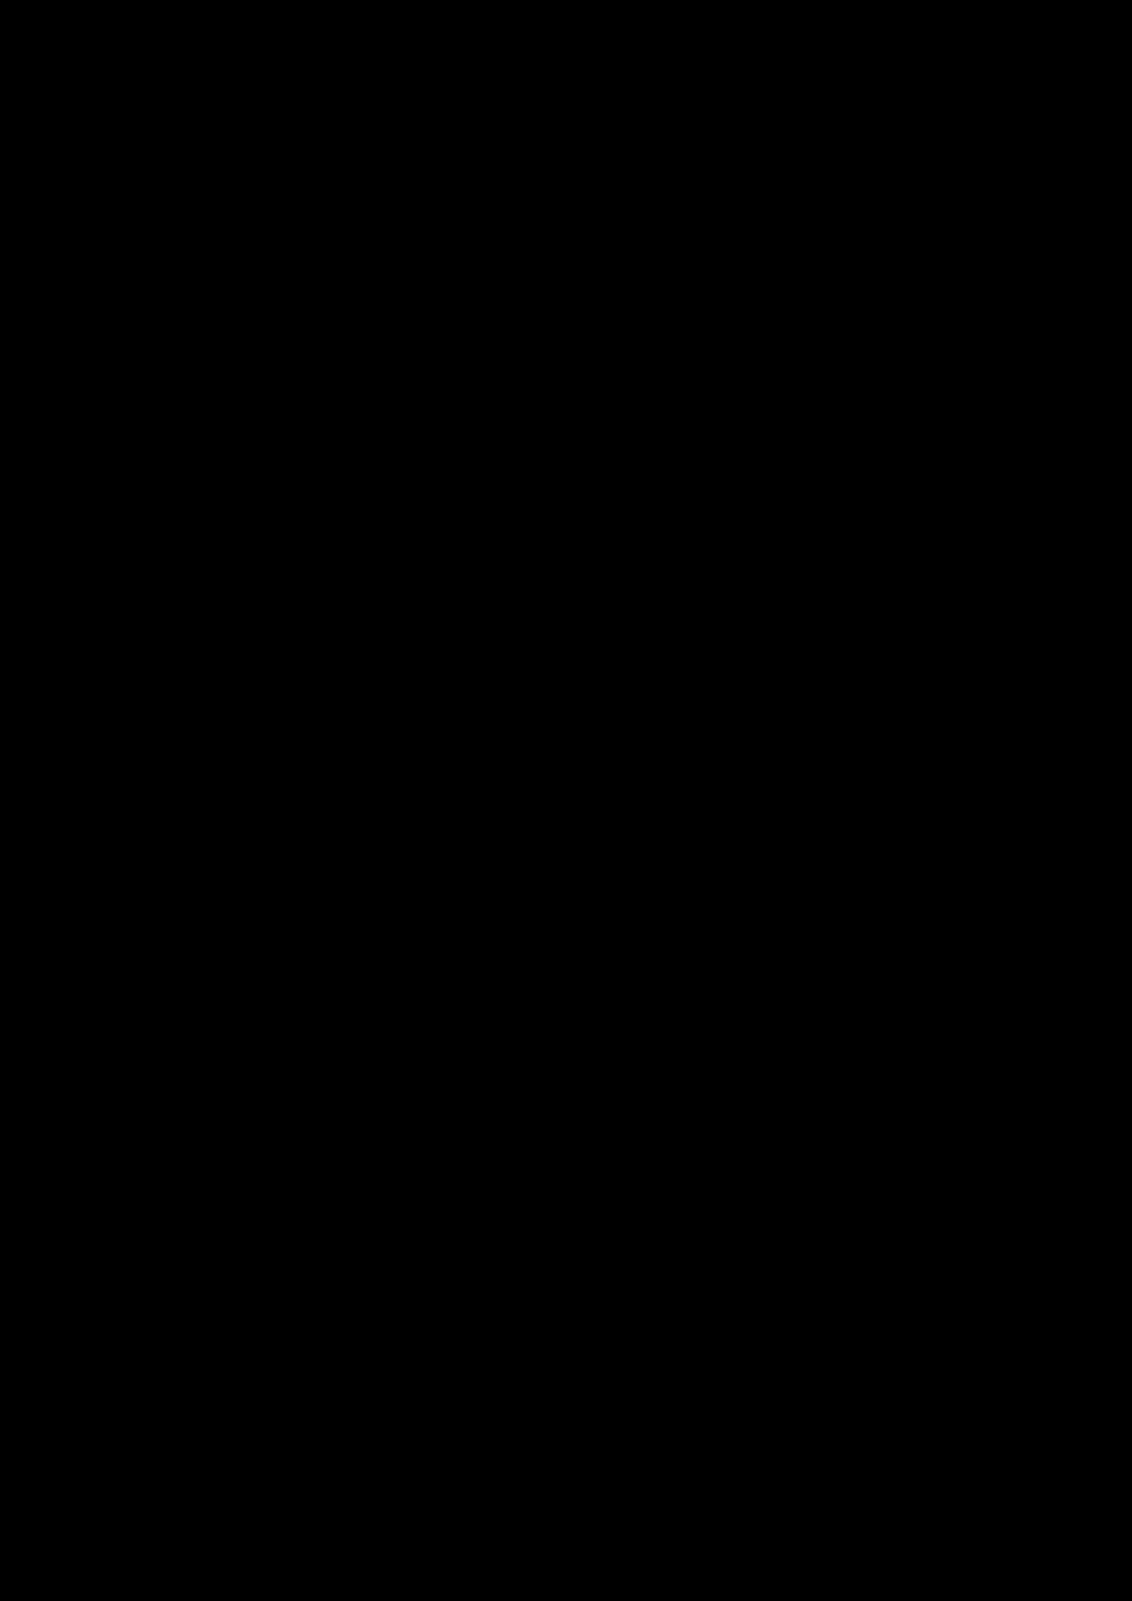 Korolevstvo slez slide, Image 4